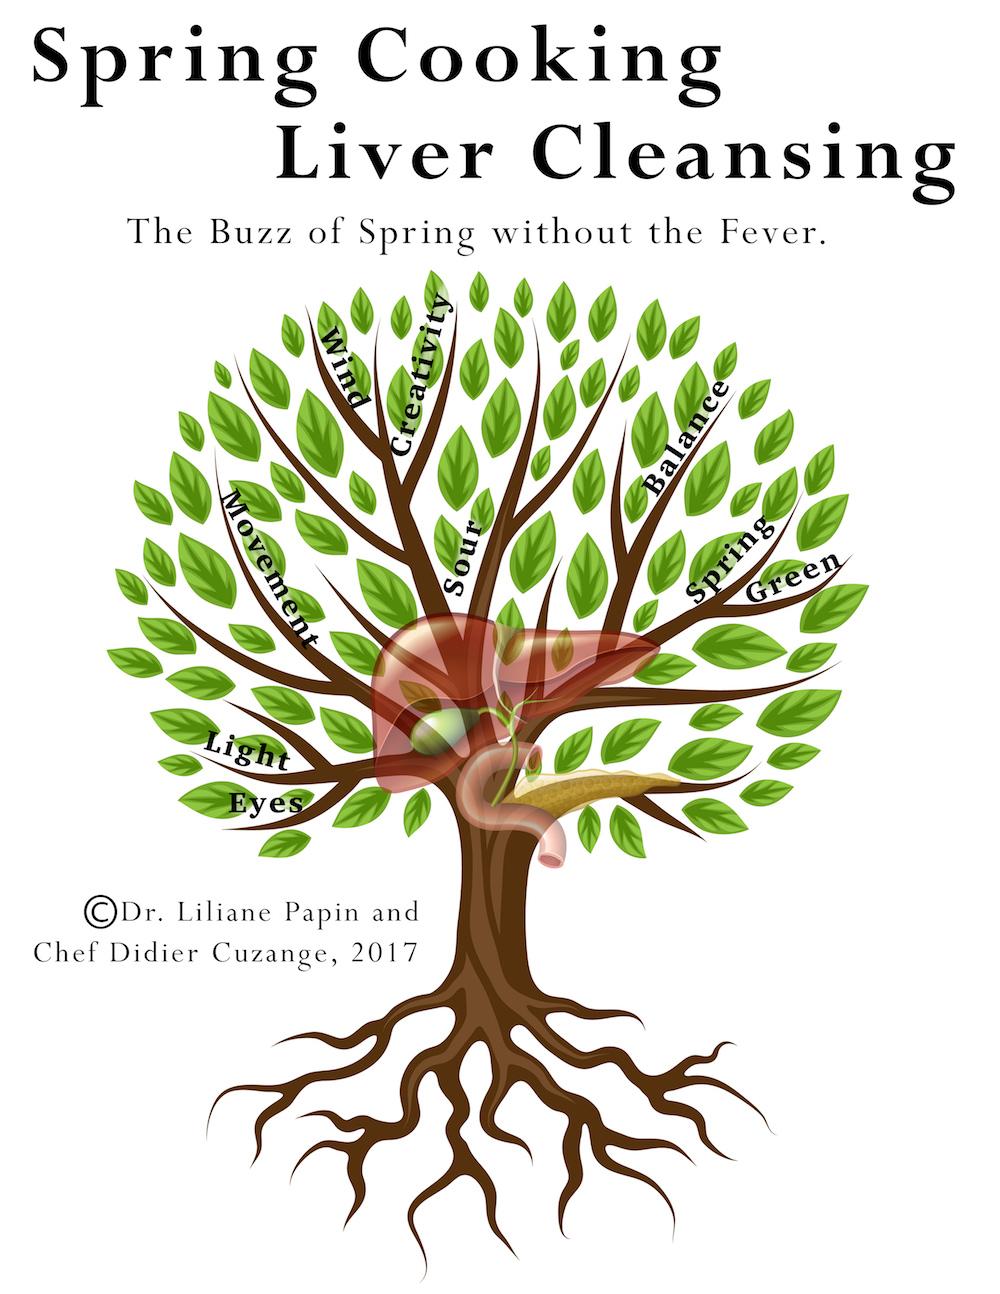 New ebook on Liver and Gallbladder Health